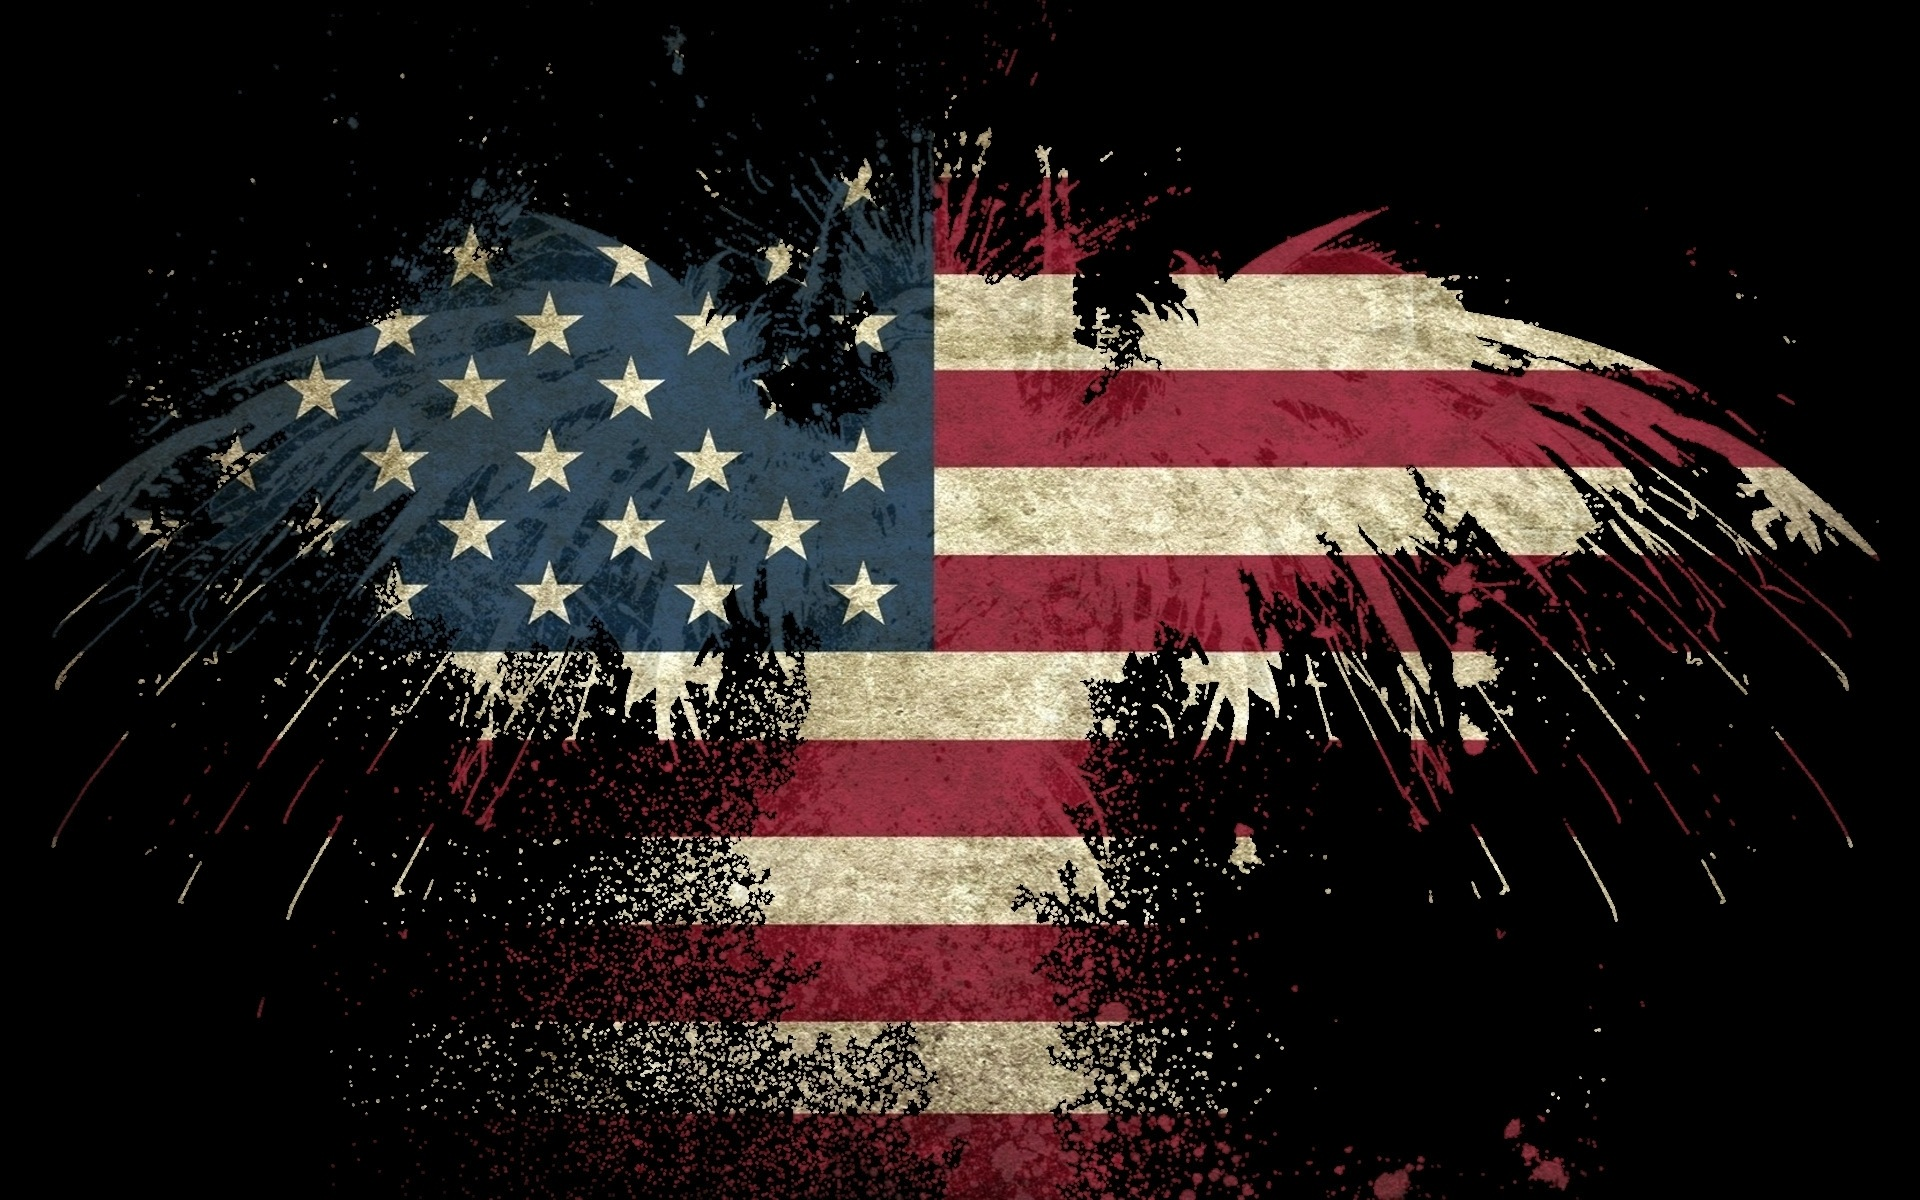 Hd wallpaper usa flag - United States Flag Full Hd Wallpapers Download Free Desktop